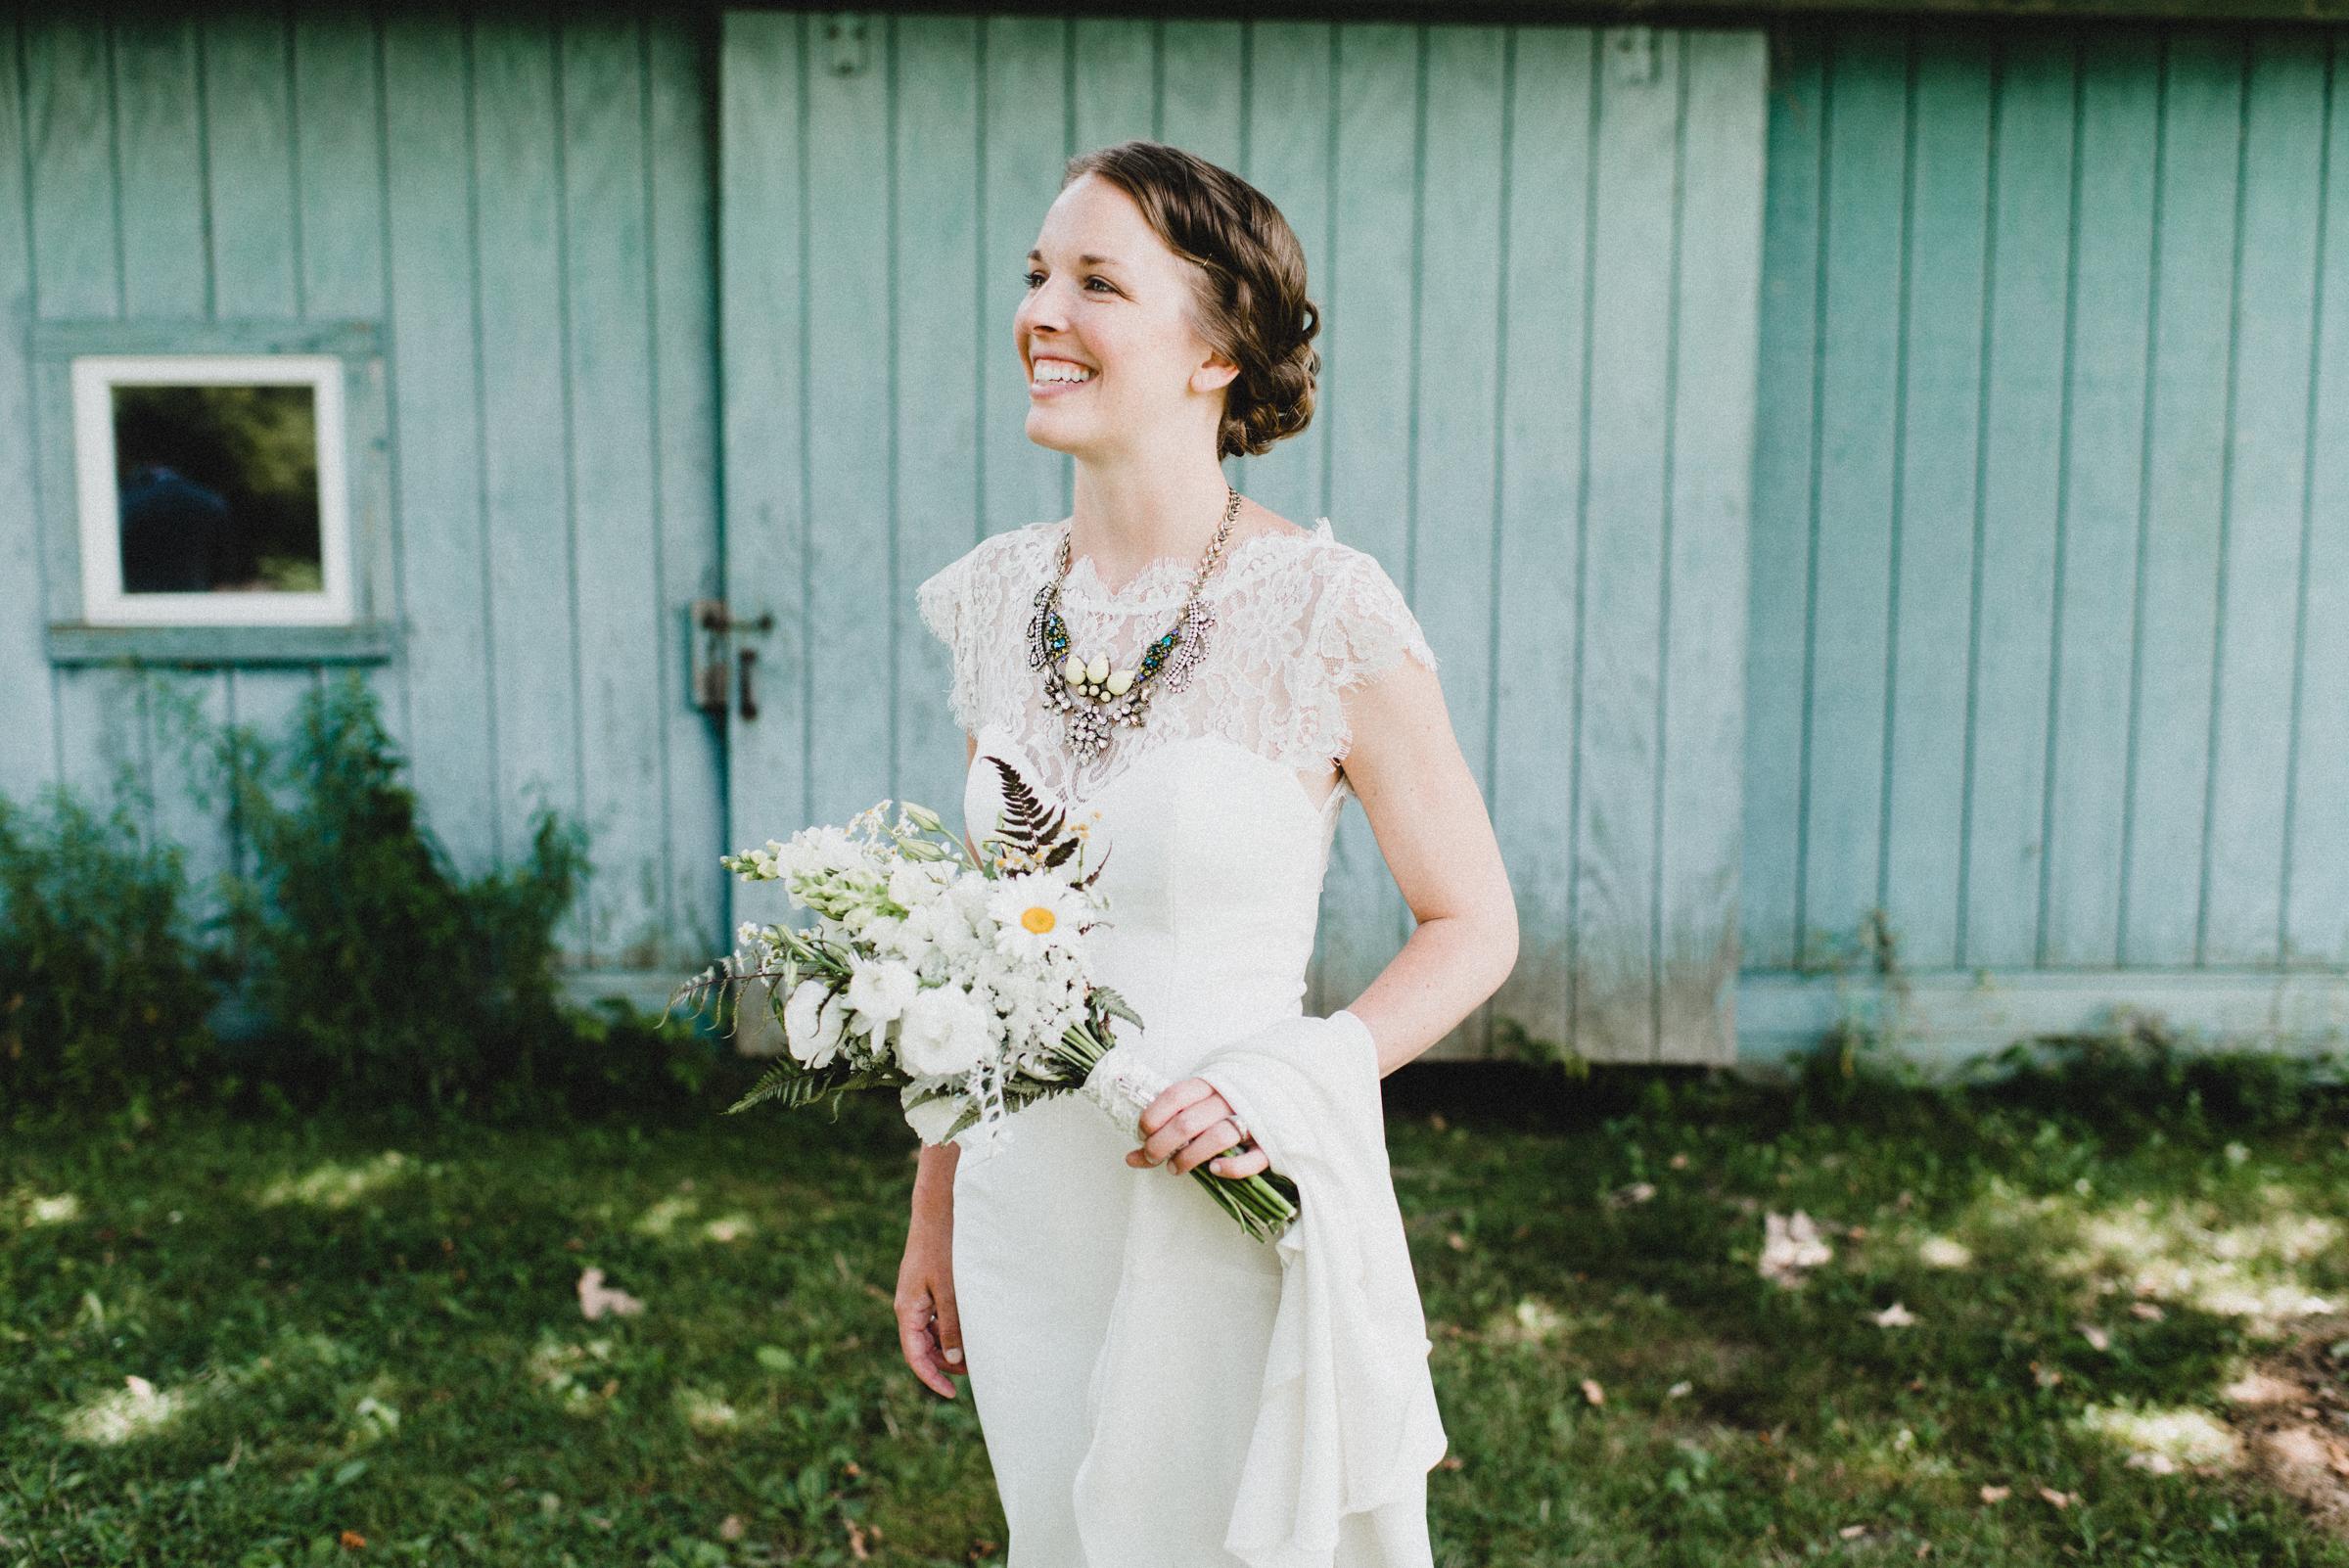 Intimate-Backyard-Farmhouse-Ohio-Wedding-Andi+Ben_Mallory+Justin-Photographers-135.JPG